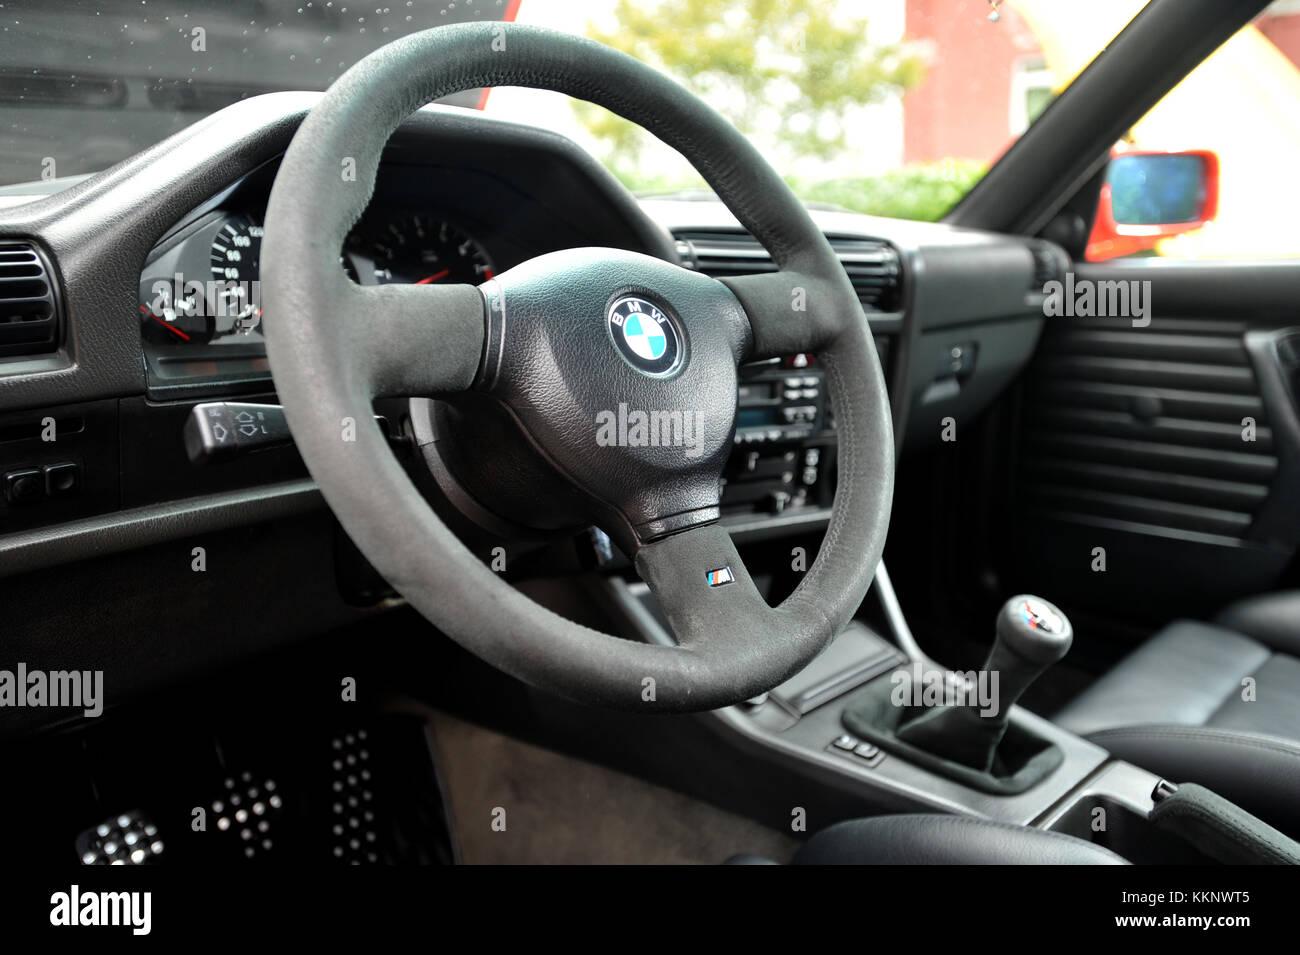 BMW E30 M3 interior Stock Photo: 167053045 - Alamy